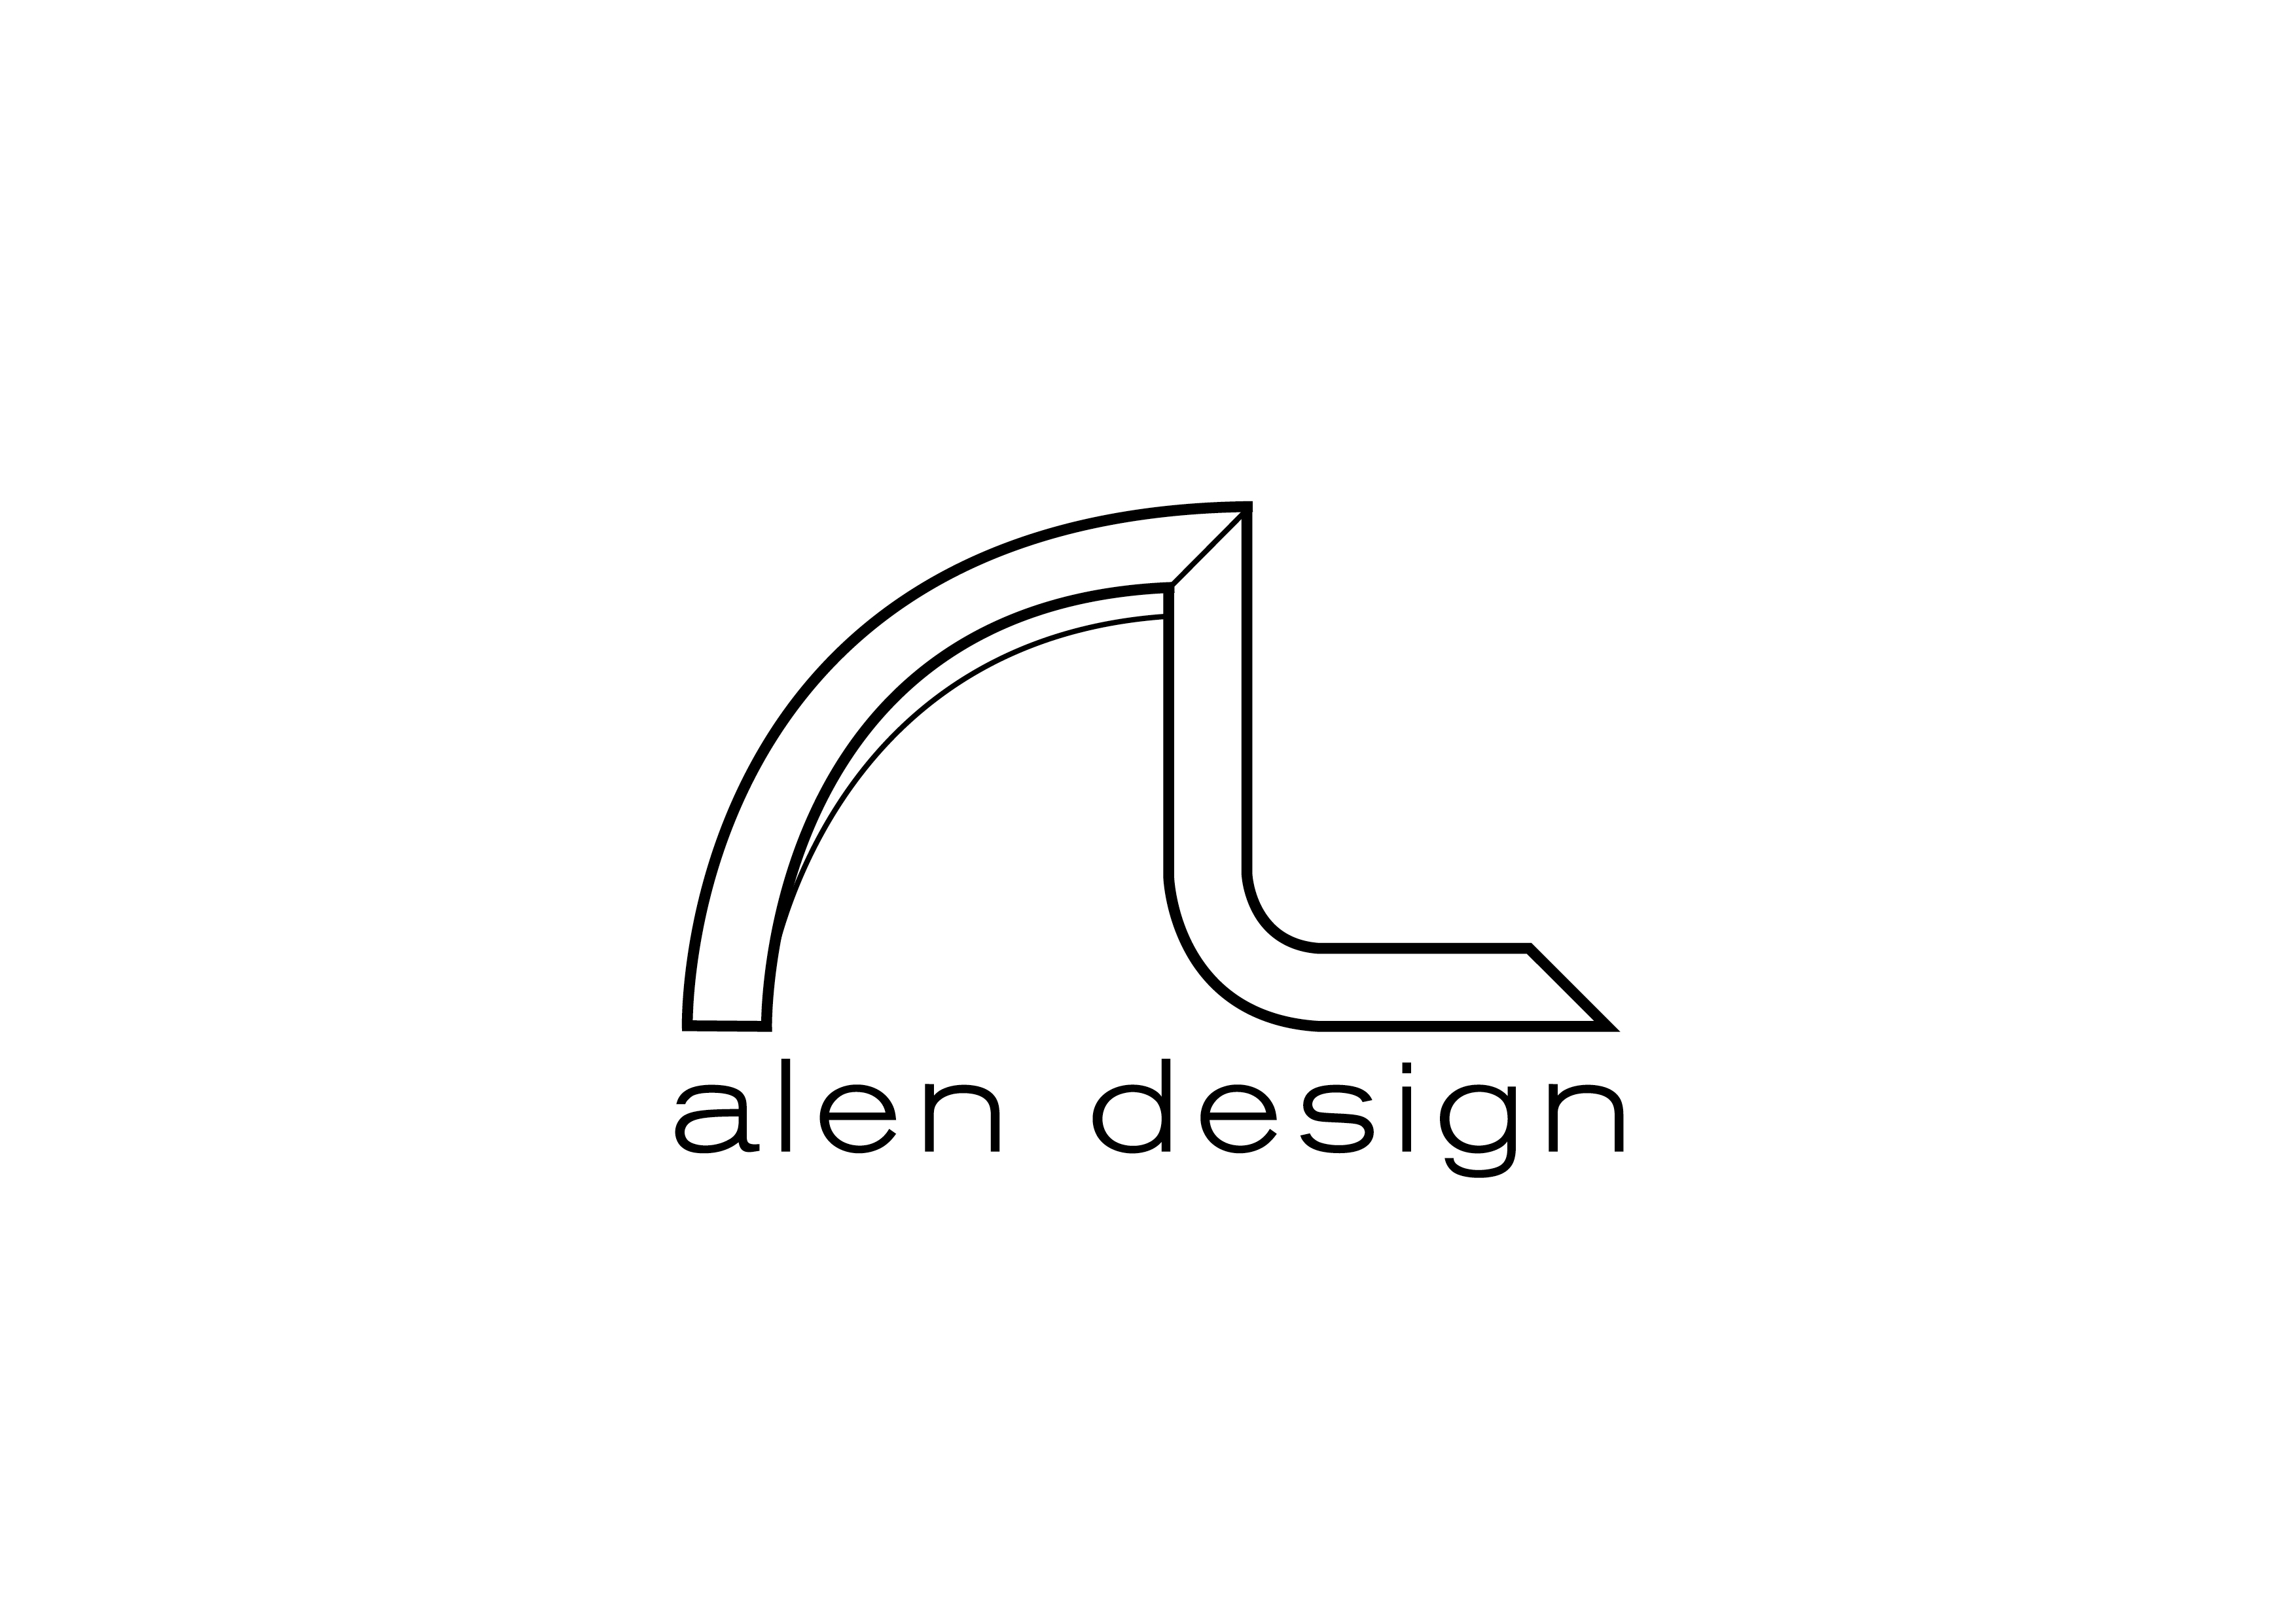 News alen gmbh for Burodesign gmbh logo